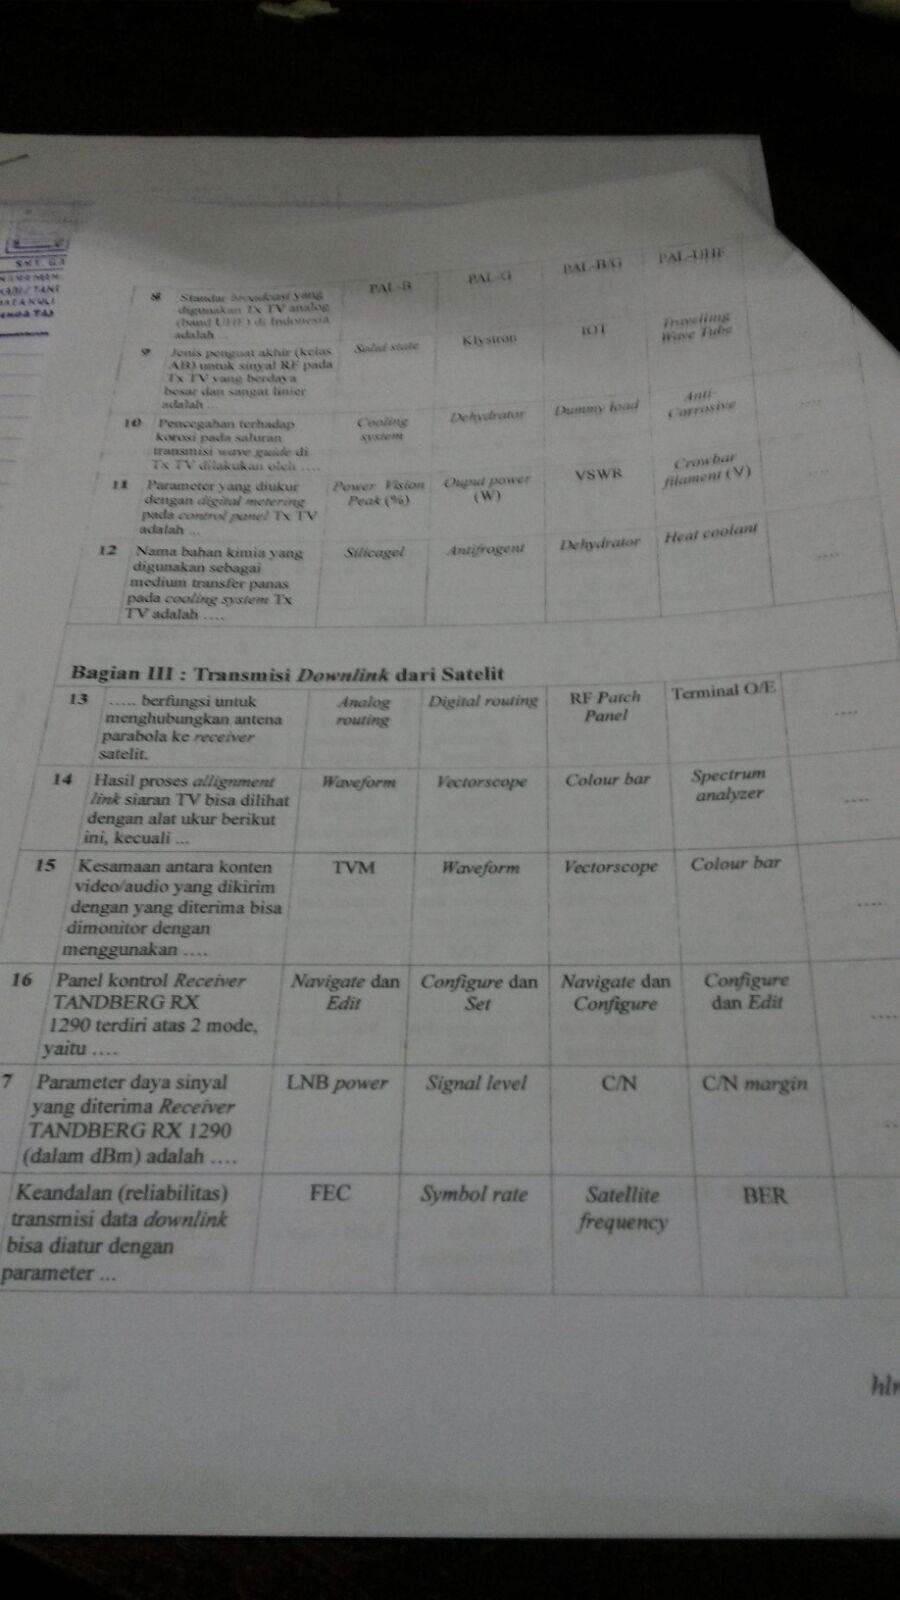 Soal Uas Semester 5 Sistem Televisi Dokumen 471